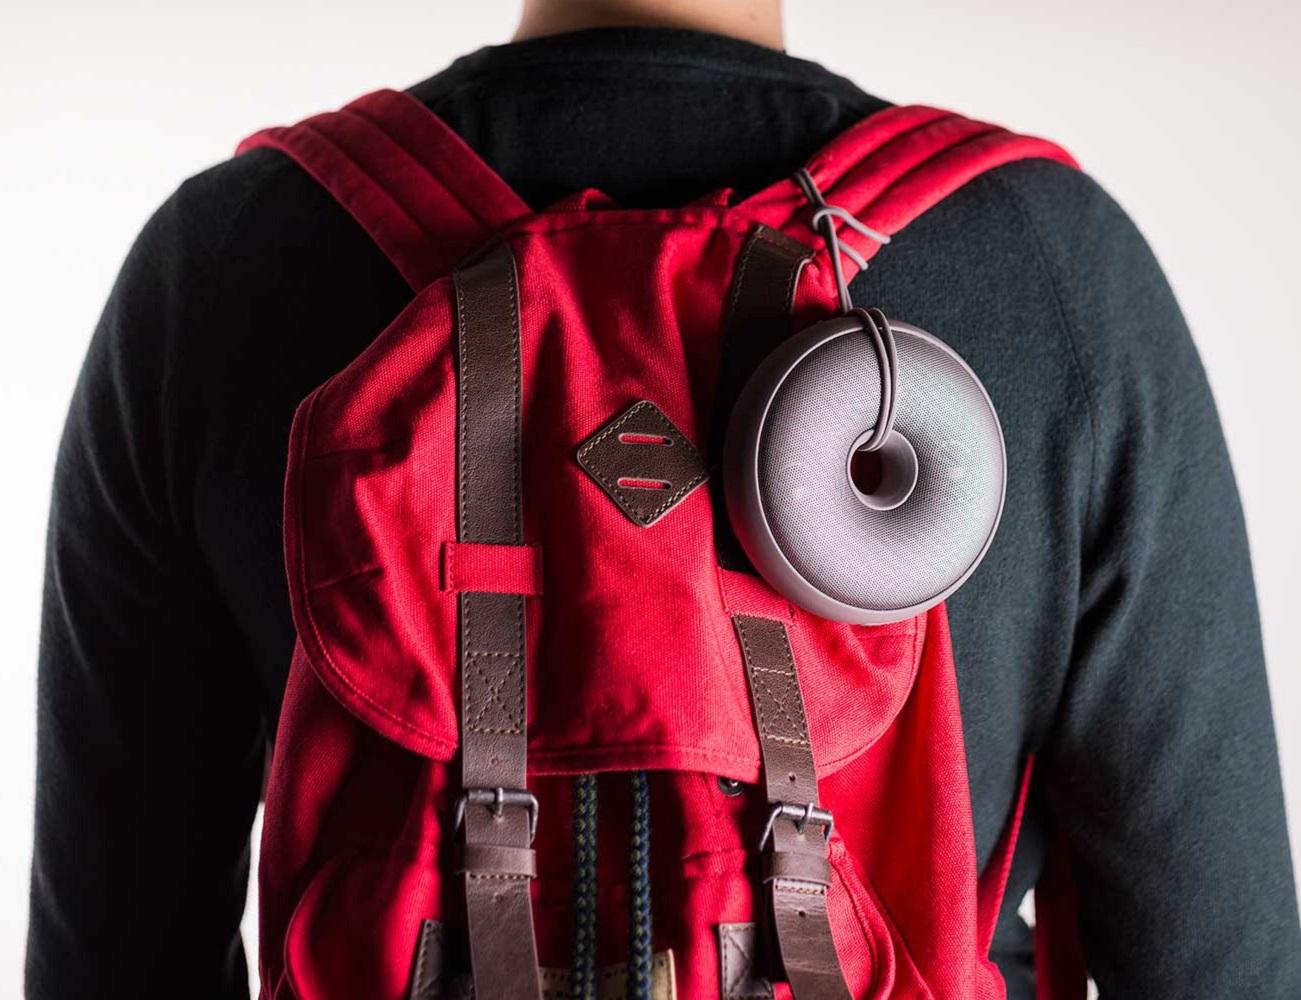 Hoop Speaker by Lexon – Wearable Speaker as a Hoop